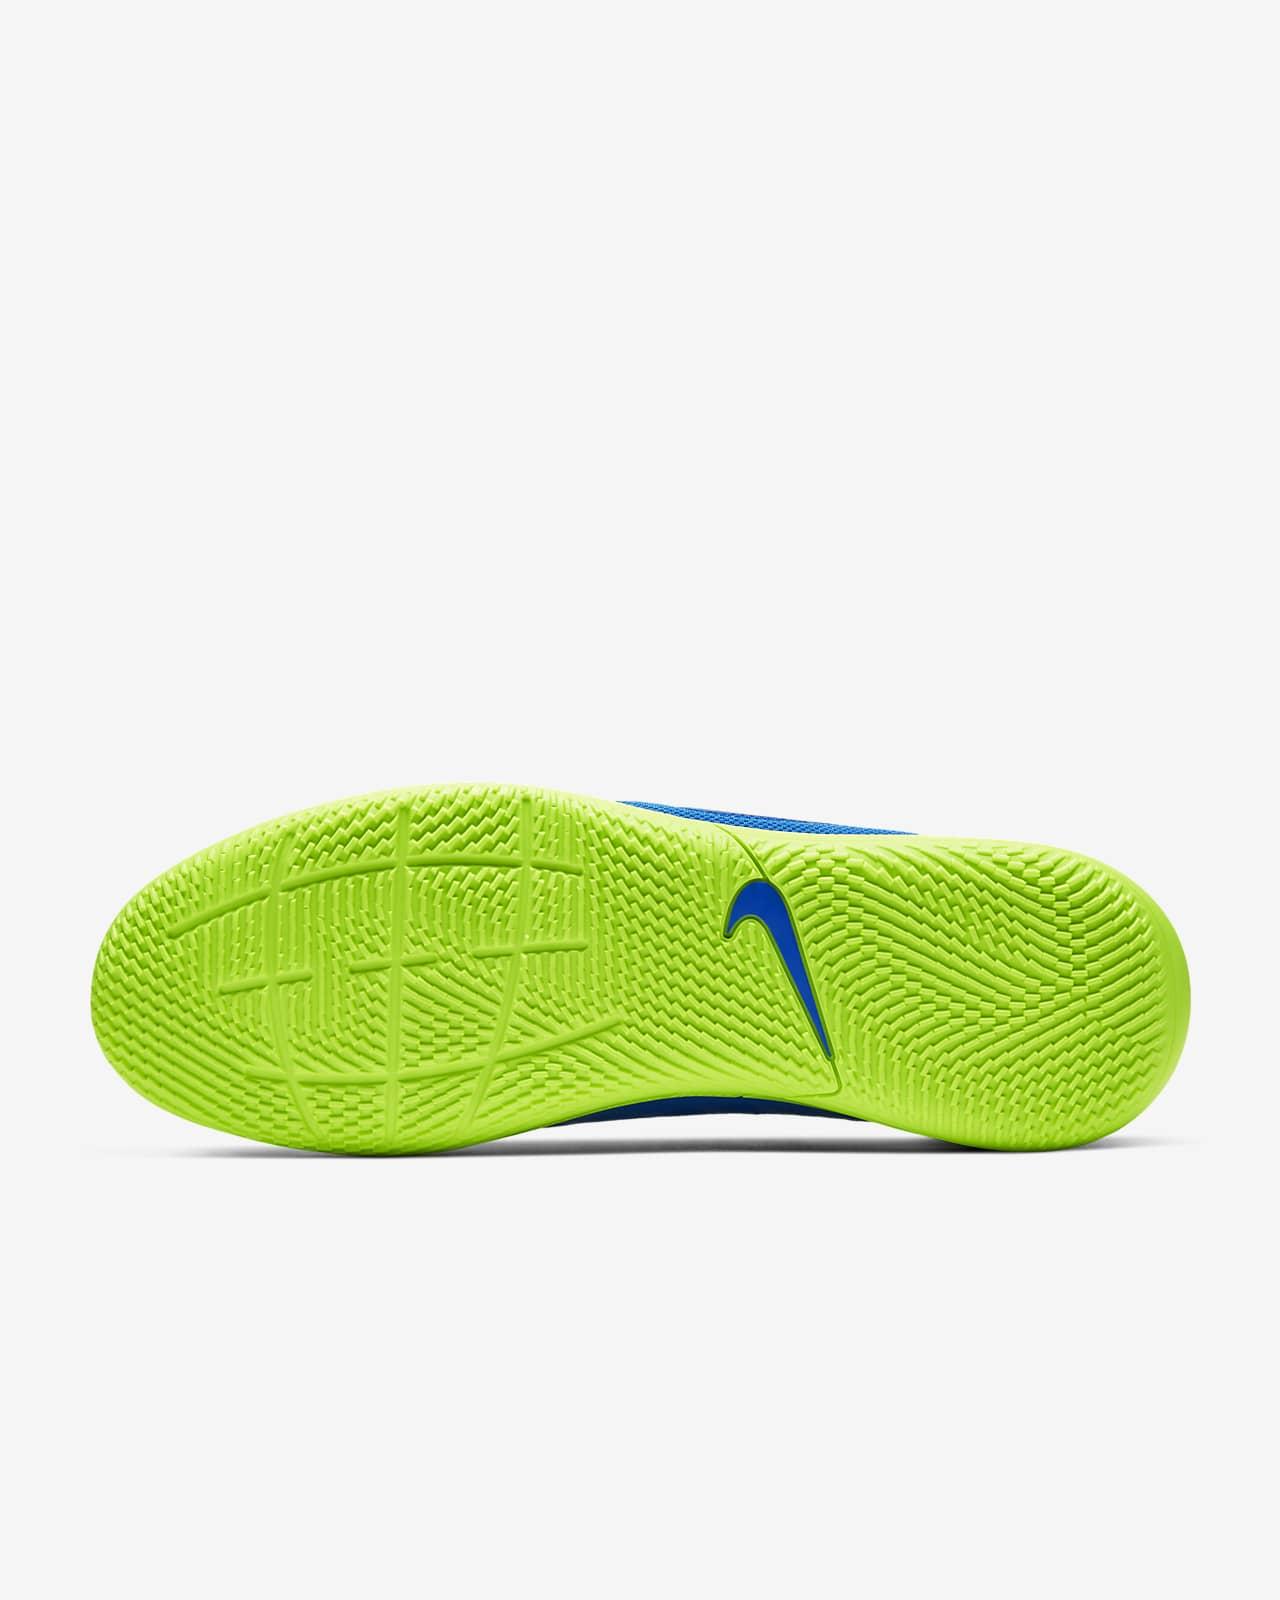 mero simpatía Chirrido  Nike Tiempo Legend 8 Club IC Botas de fútbol sala. Nike ES